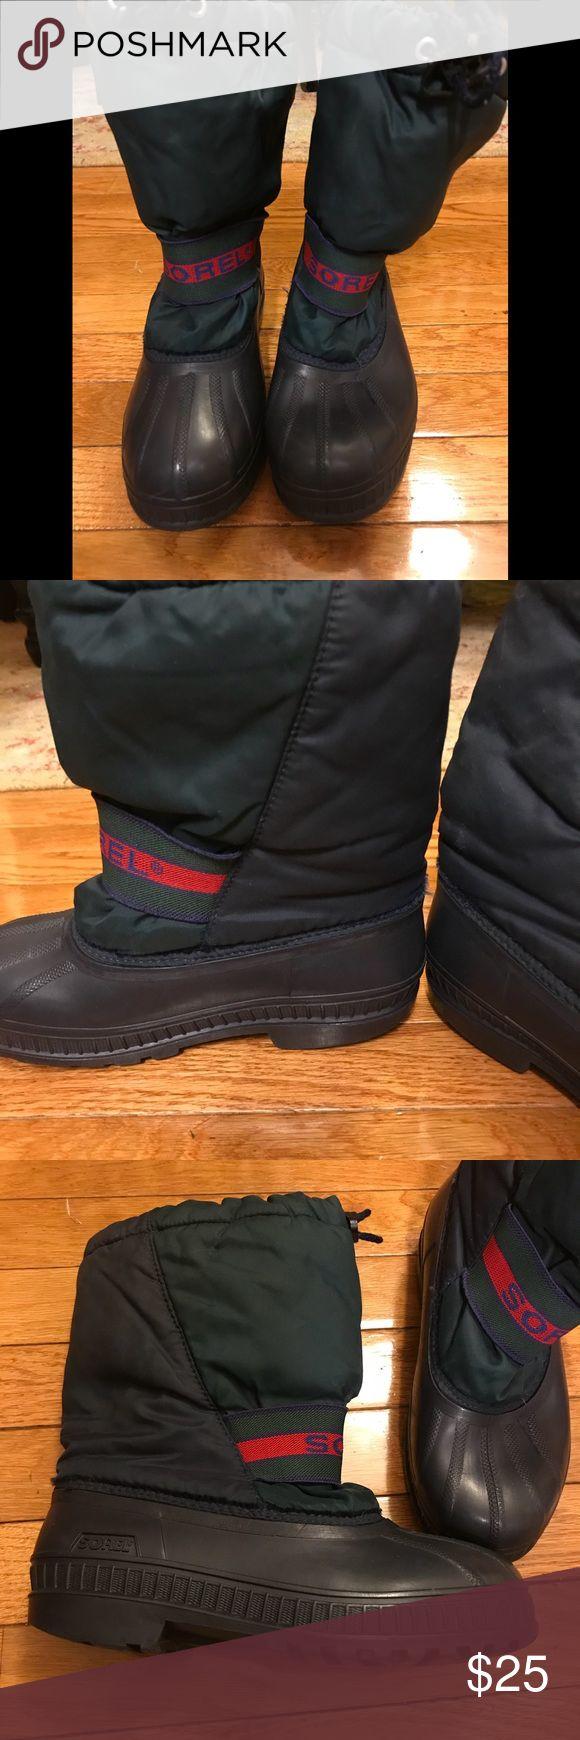 Sorel kids winter boots Good clean condition Sorel Shoes Boots